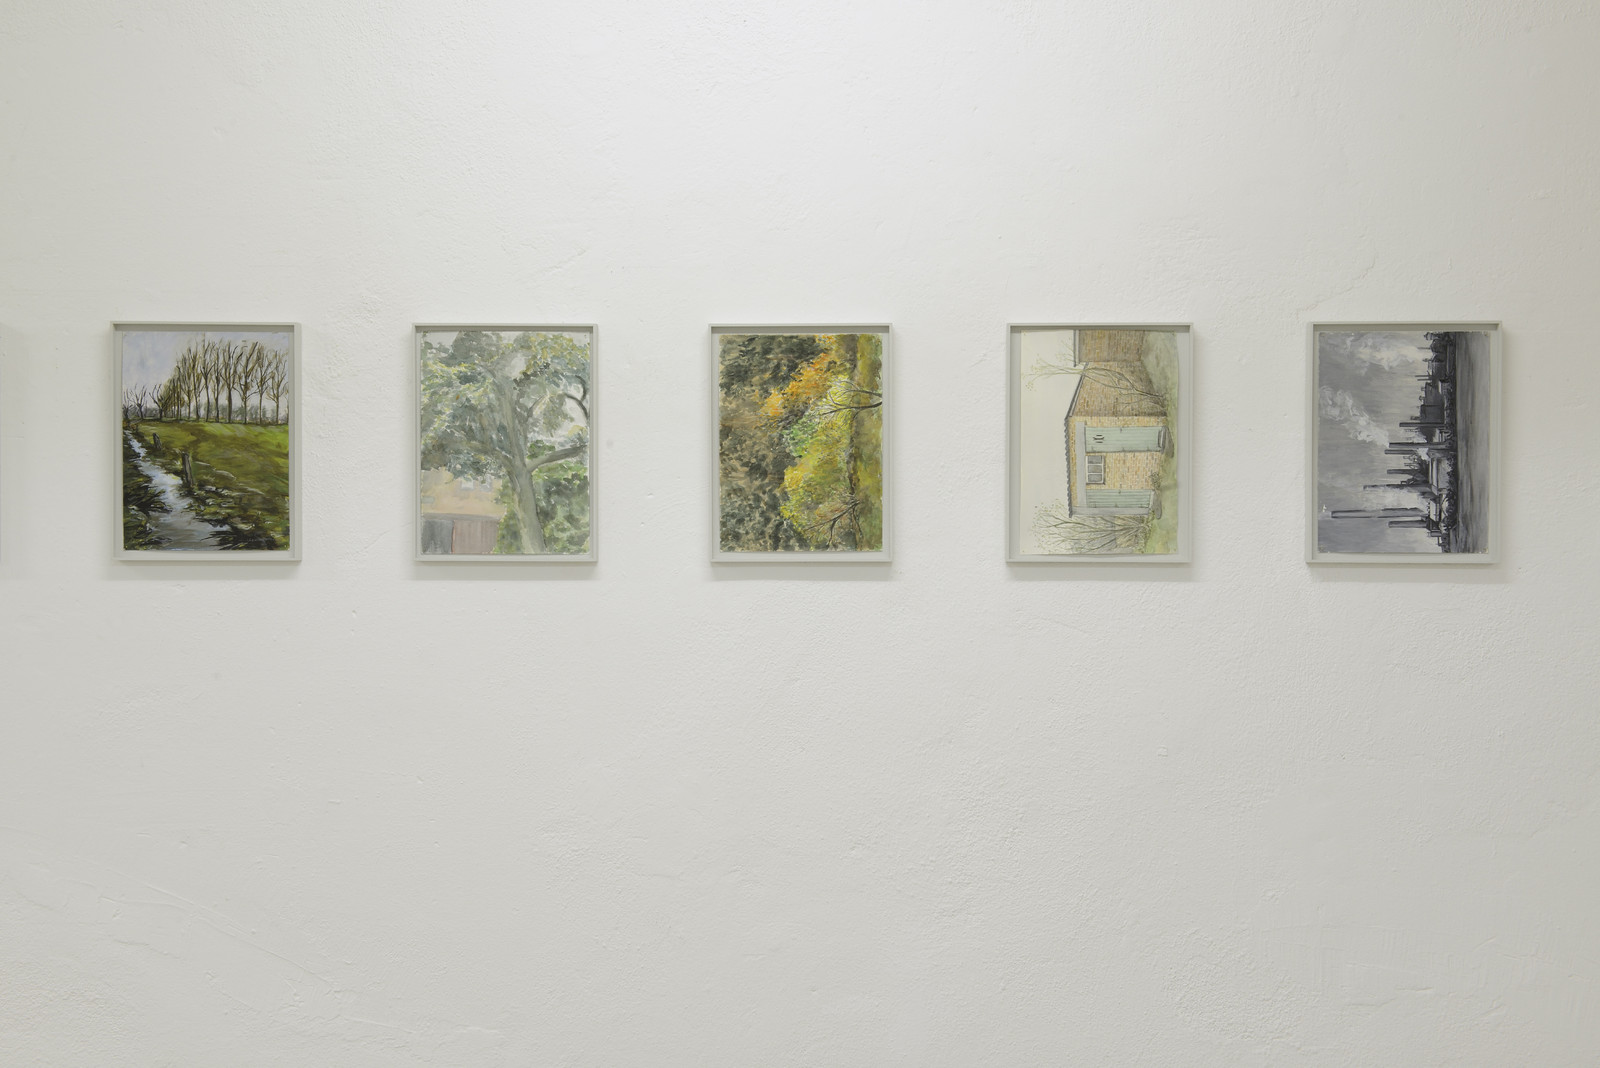 Leen Voet, Kunstbunker 10